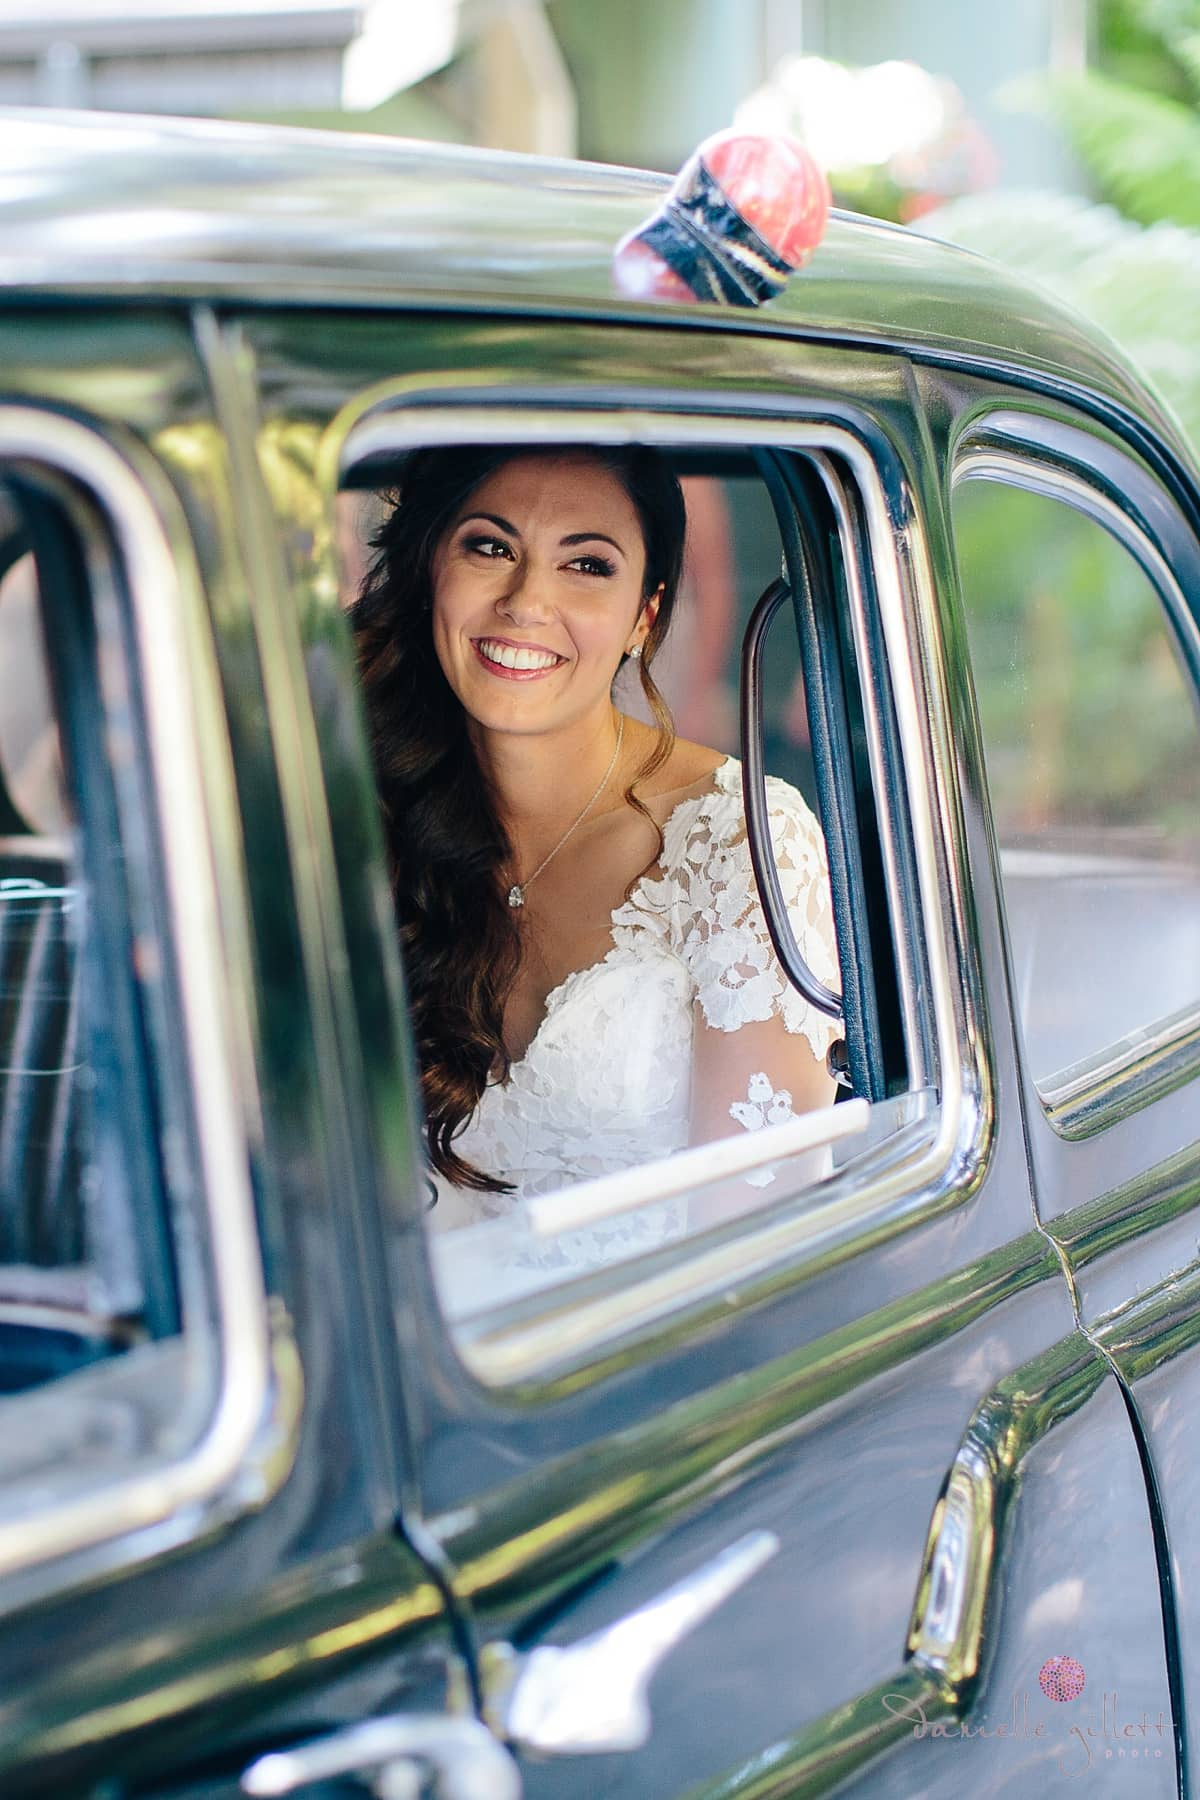 Nesldown Wedding, Danielle Gillett Photography, Whimsical Wedding, Bohemian Wedding, Bay Area Wedding, Fairytale wedding, Santa Cruz Wedding, Redwood Wedding, Bride